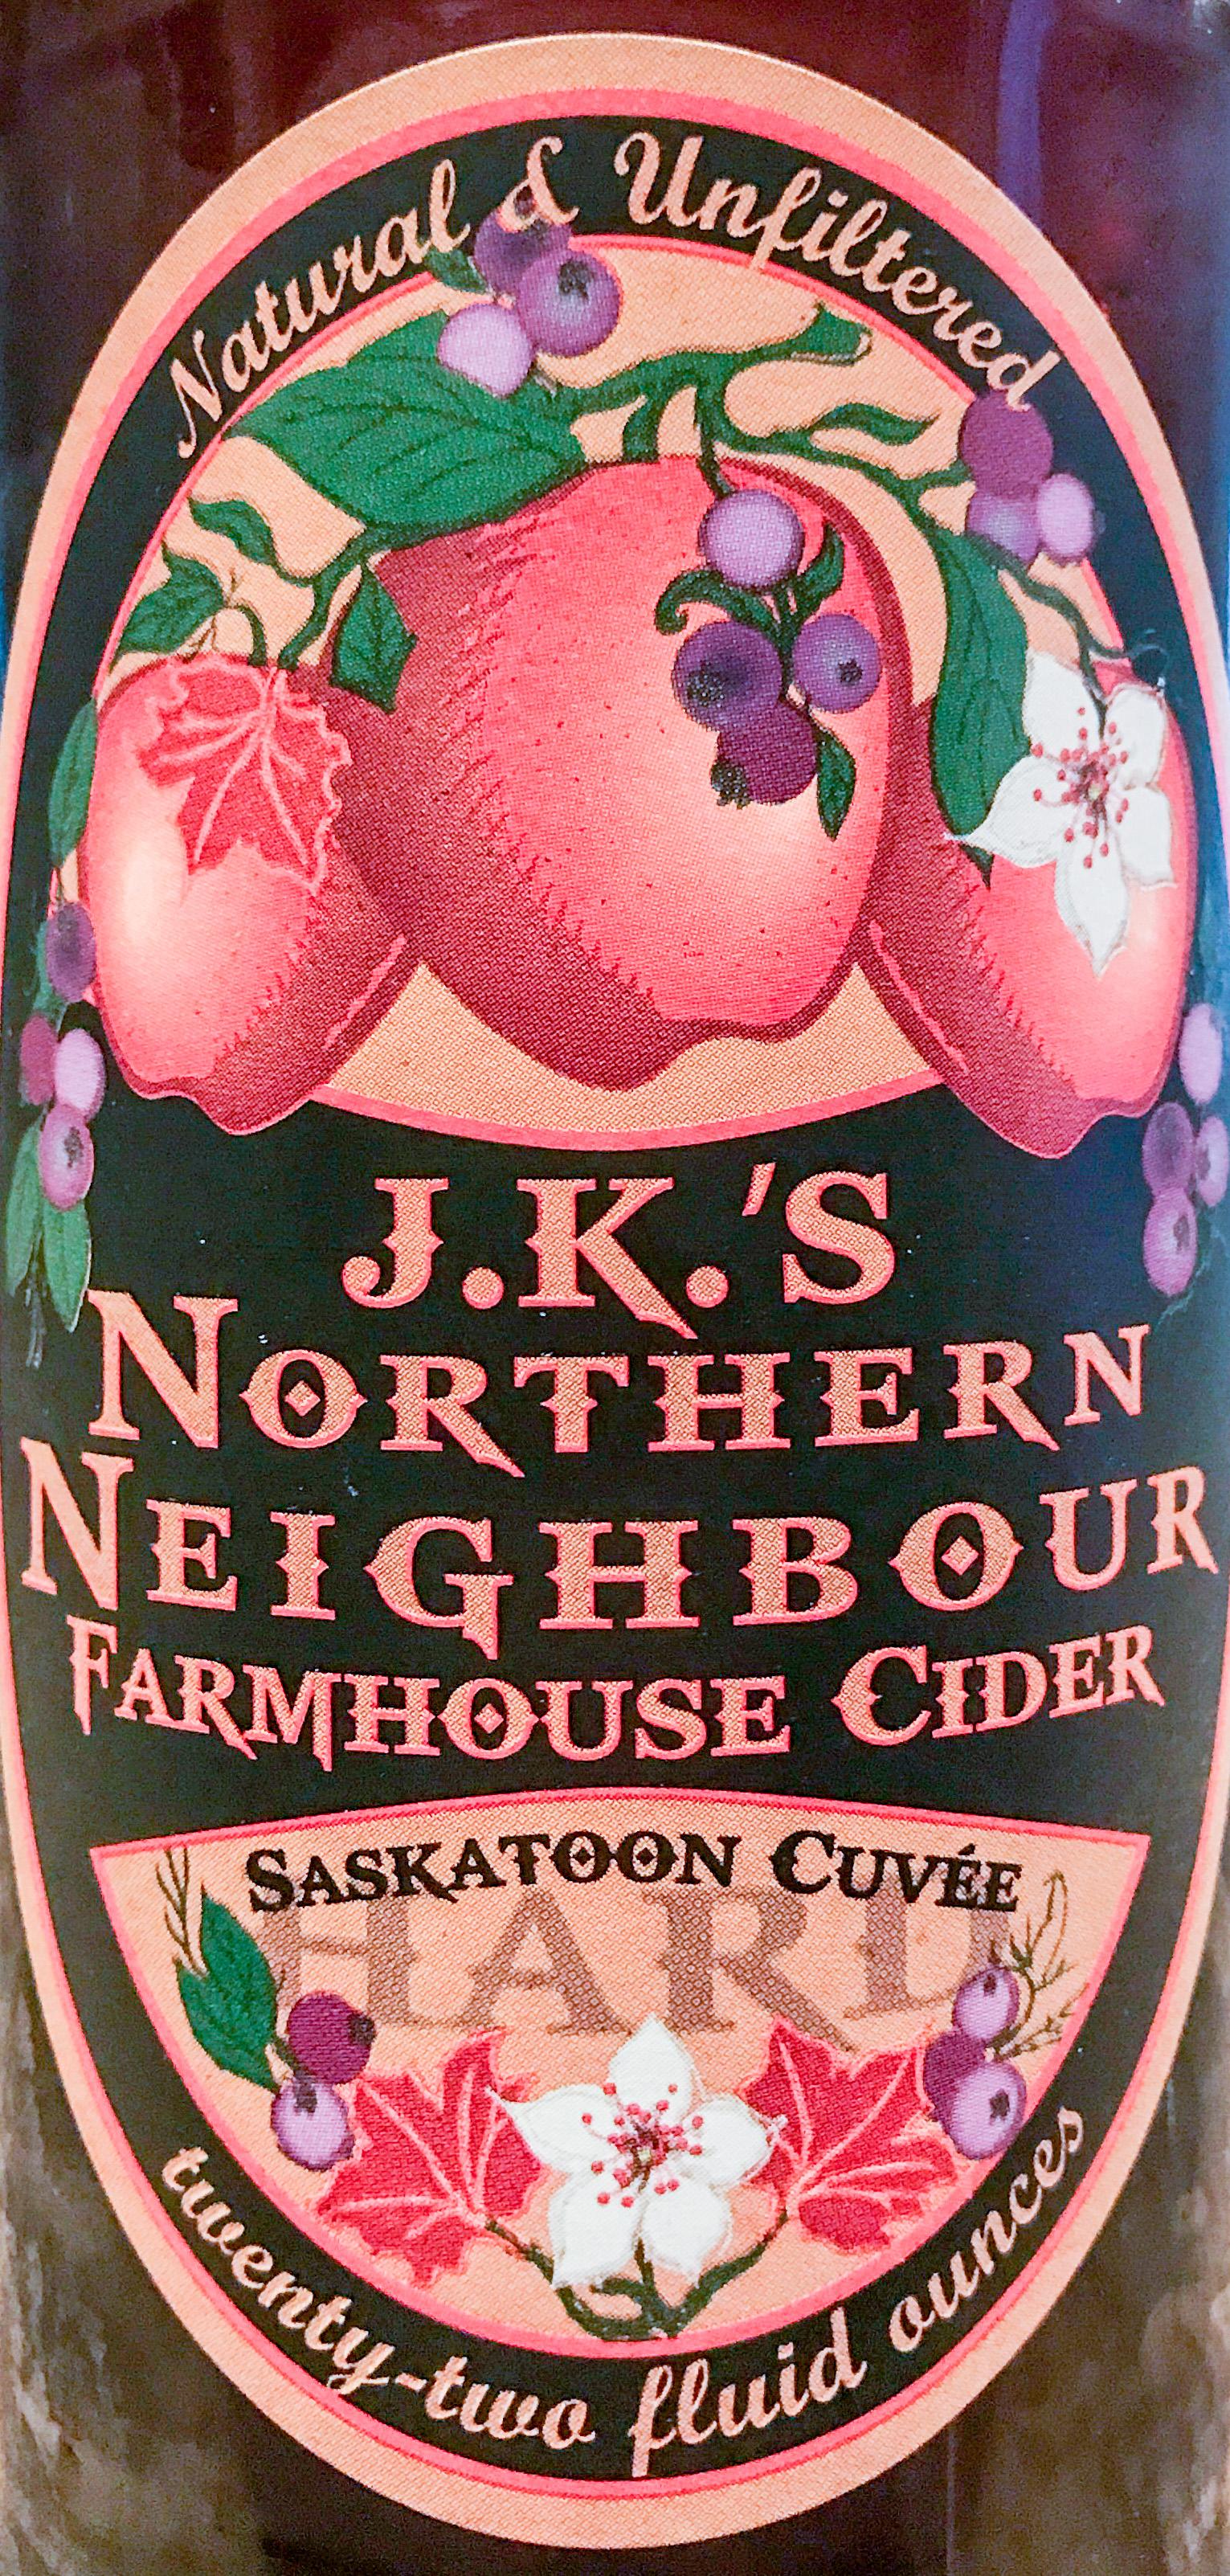 Northern Neighbour Saskatoon Cuvée